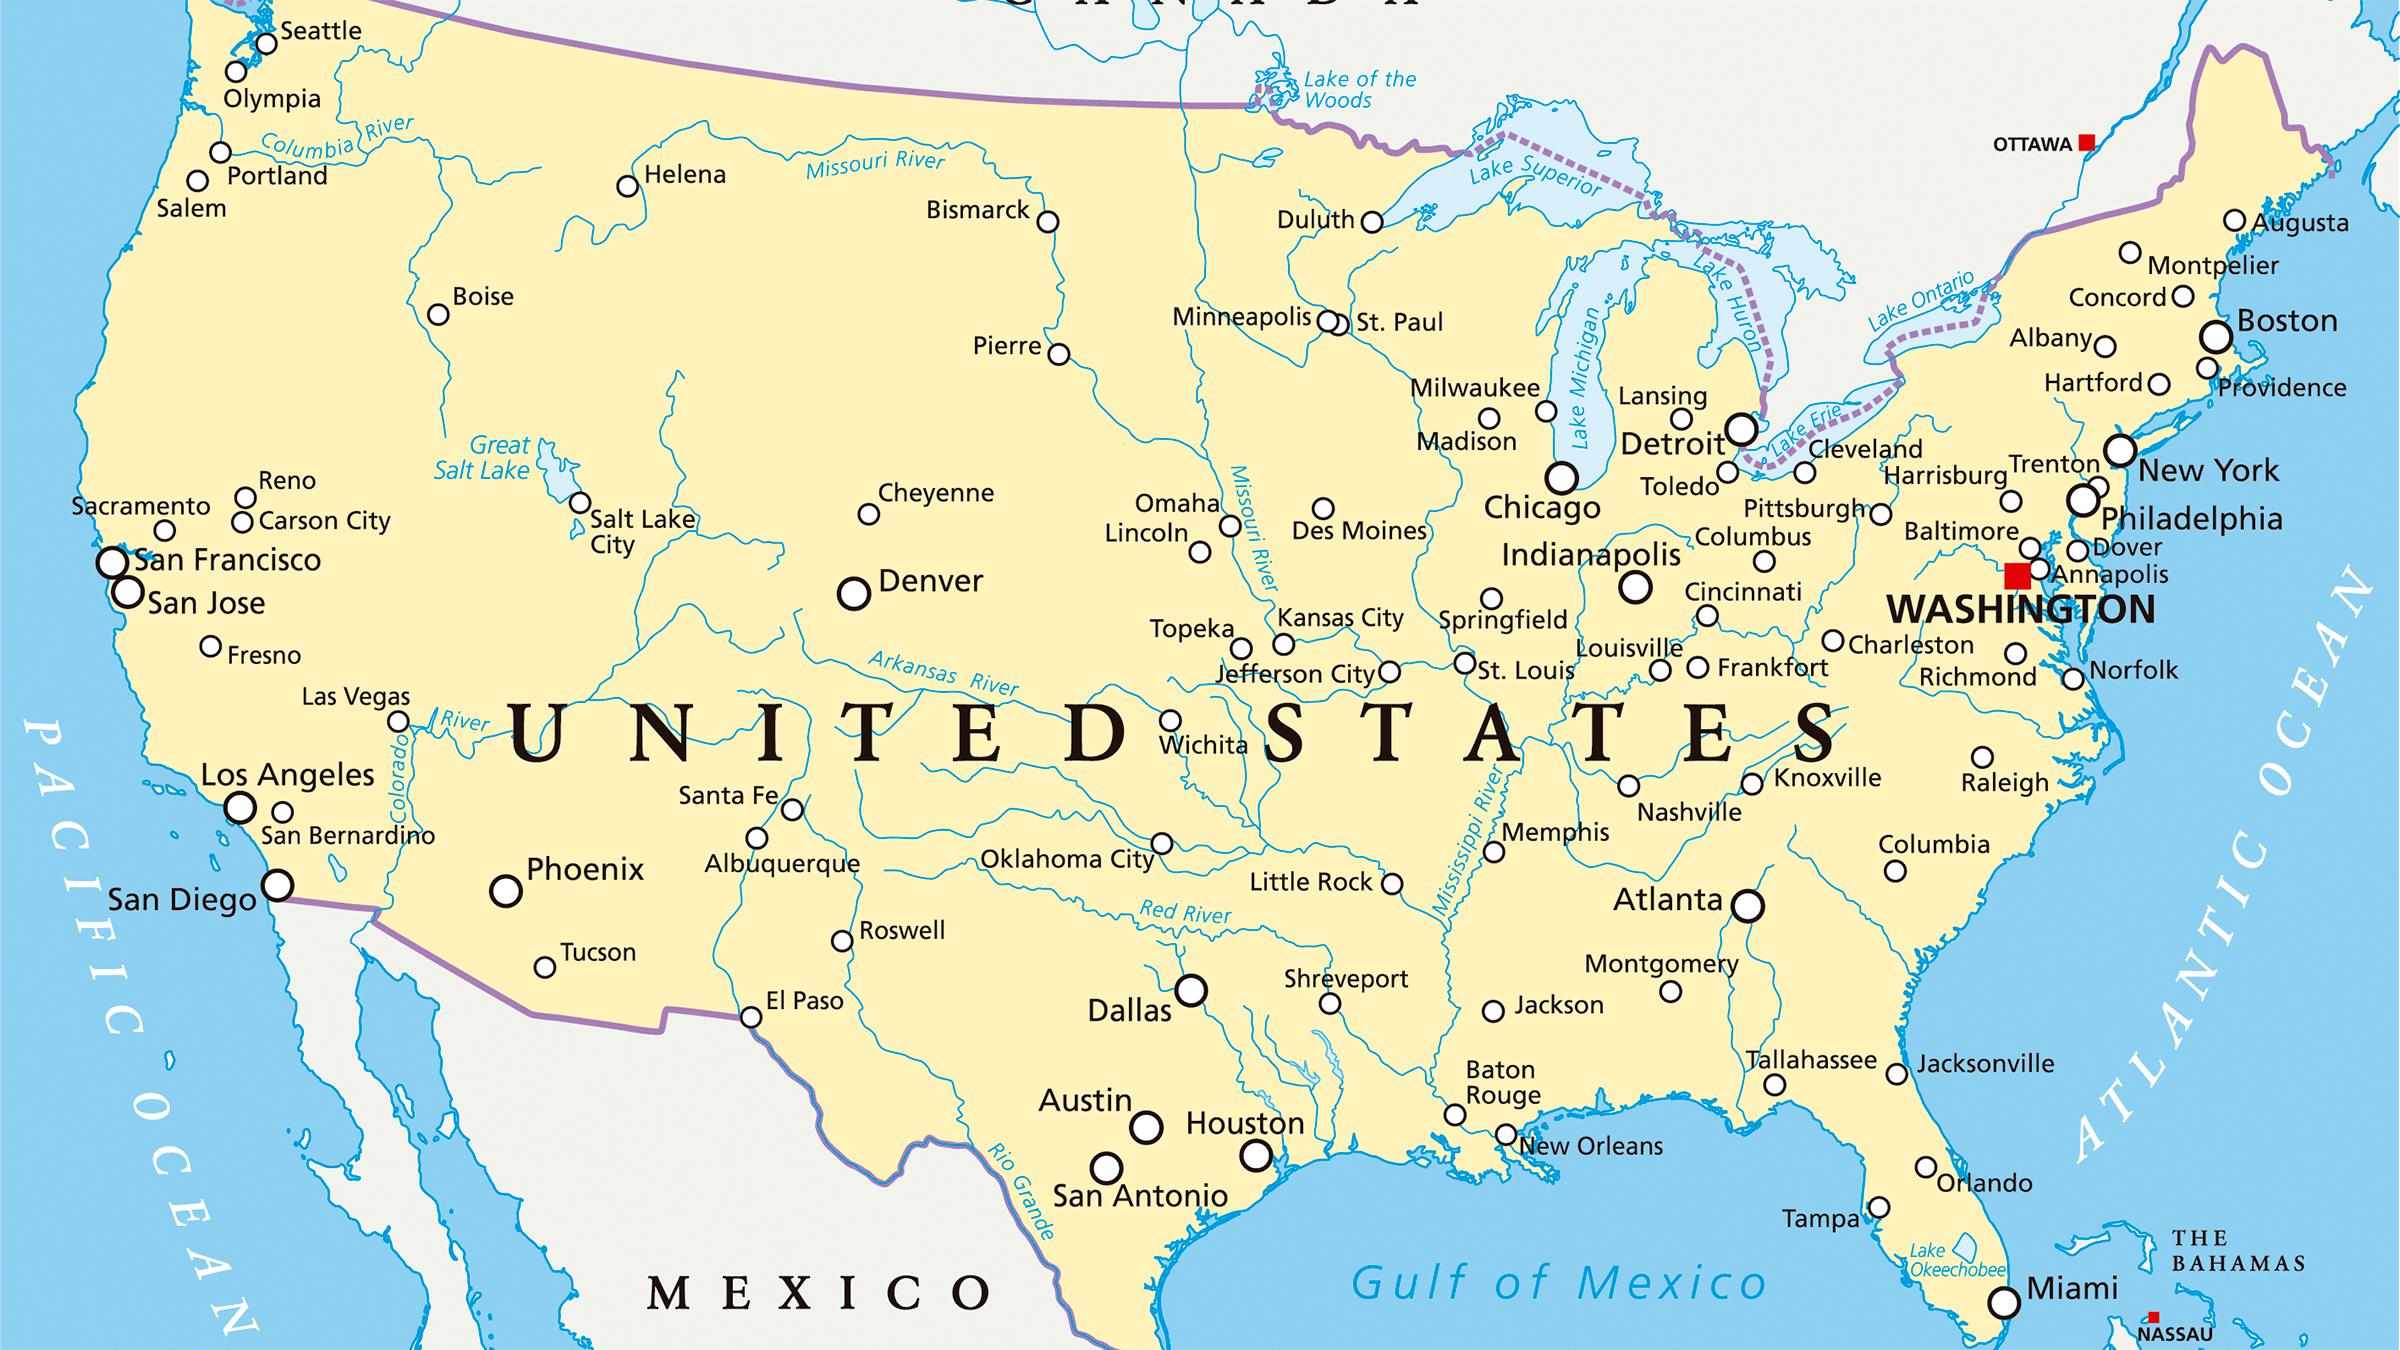 mapa dos estados unidos Mapa hidrográfico de Estados Unidos mapa dos estados unidos